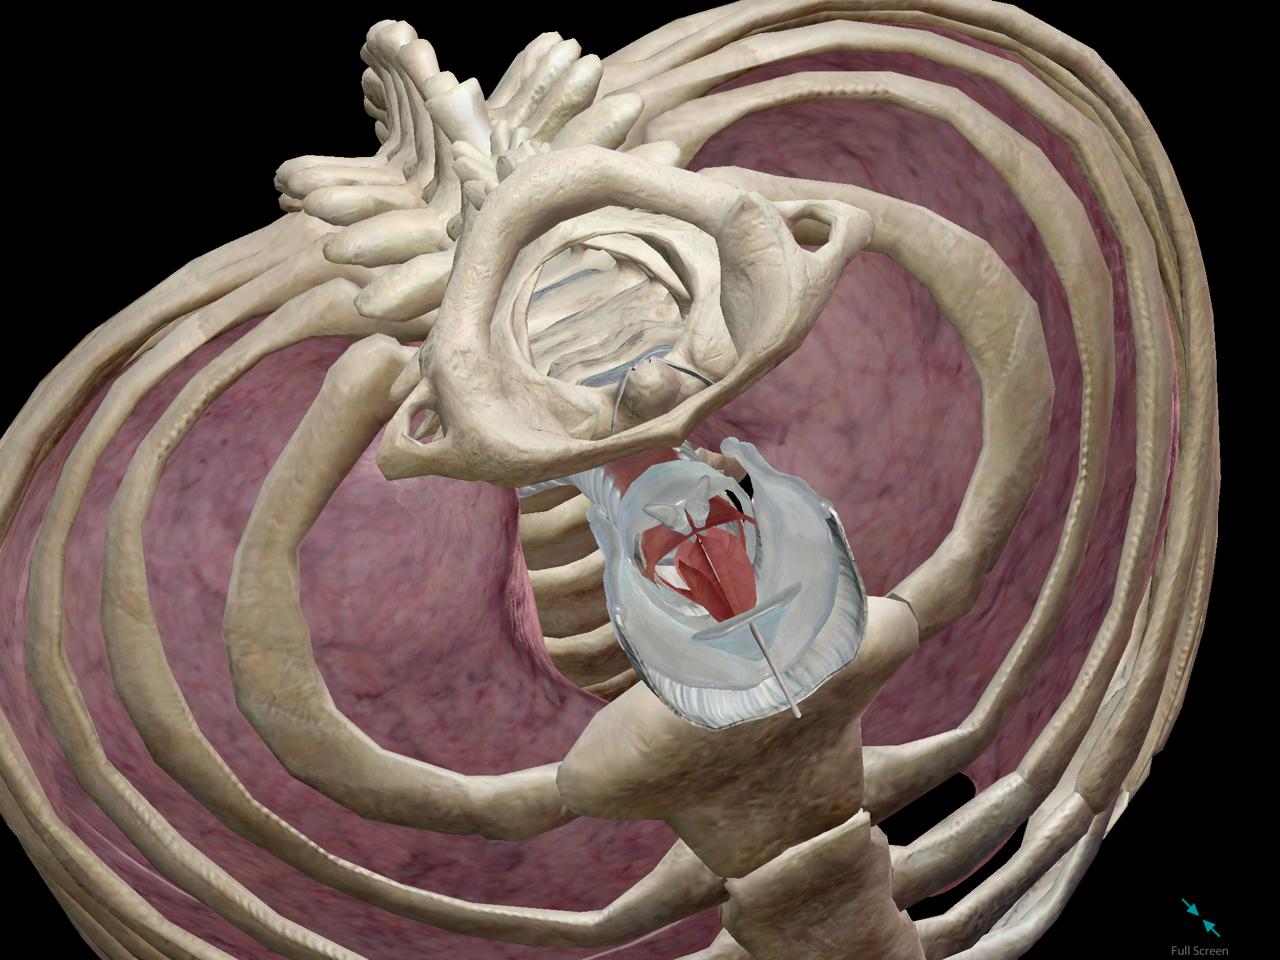 laryngeal-sksleton-lungs-respiratory.png